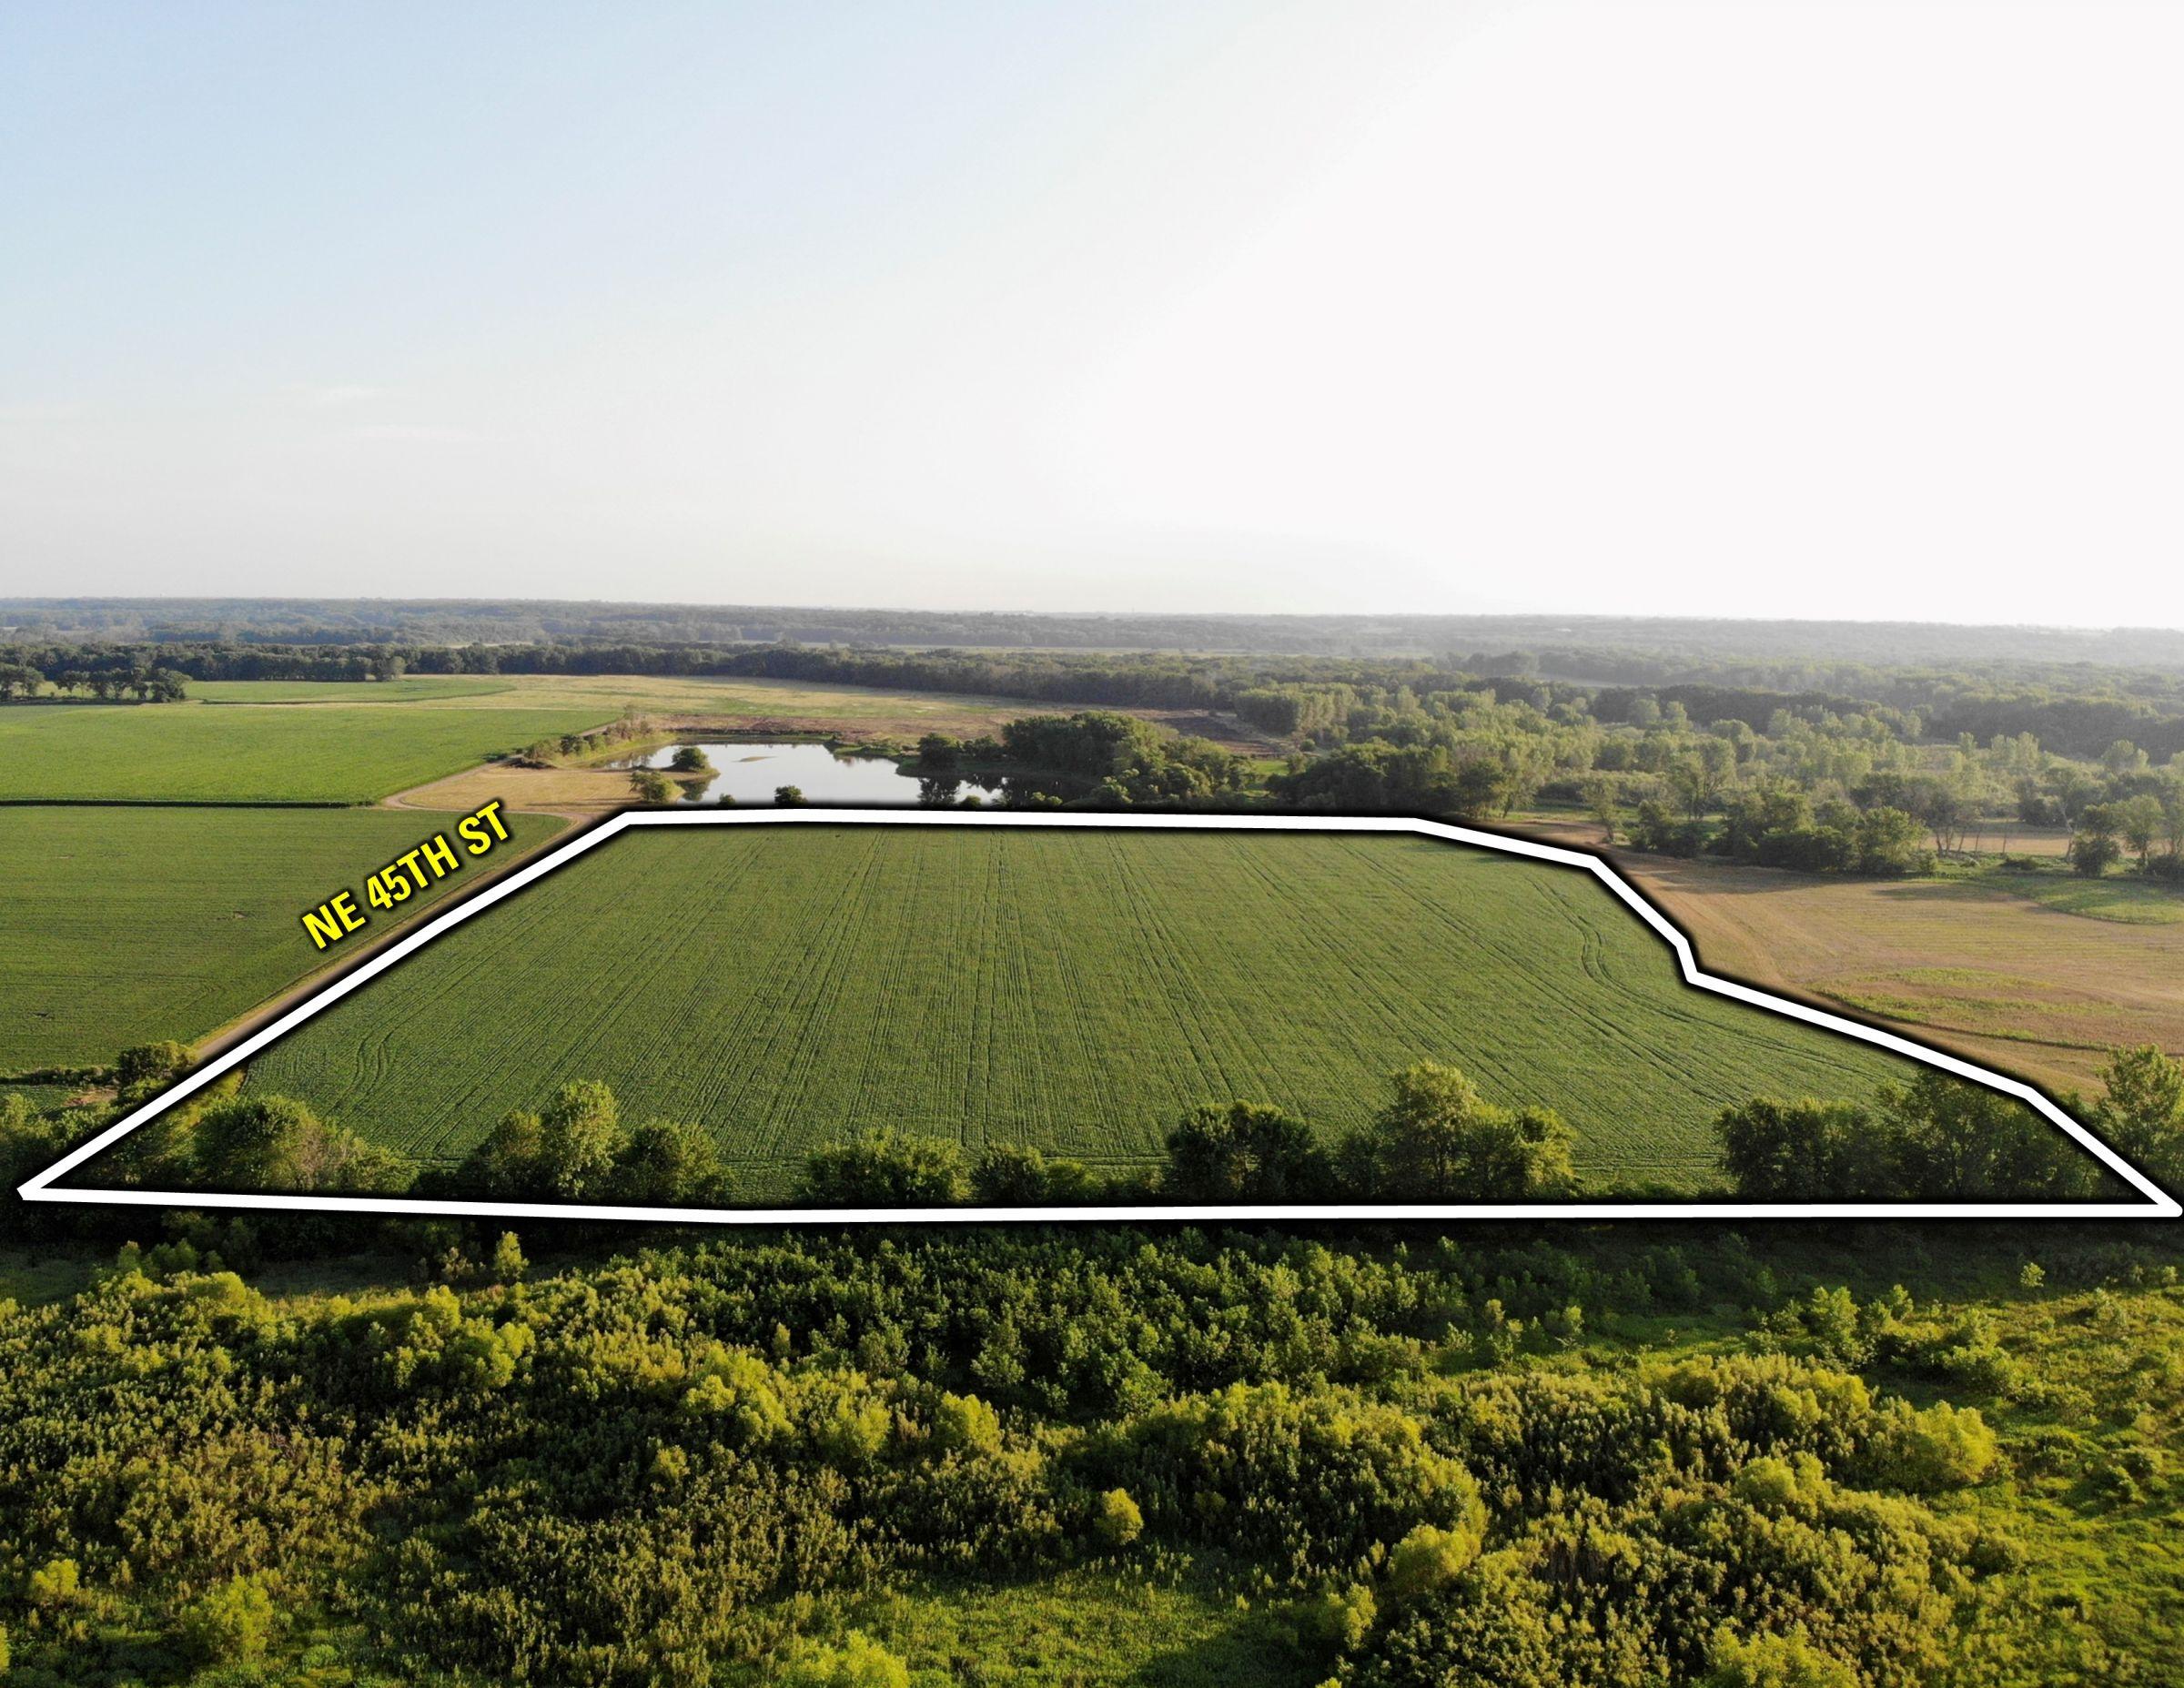 land-warren-county-iowa-27-acres-listing-number-15624-1-2021-07-07-185155.jpg